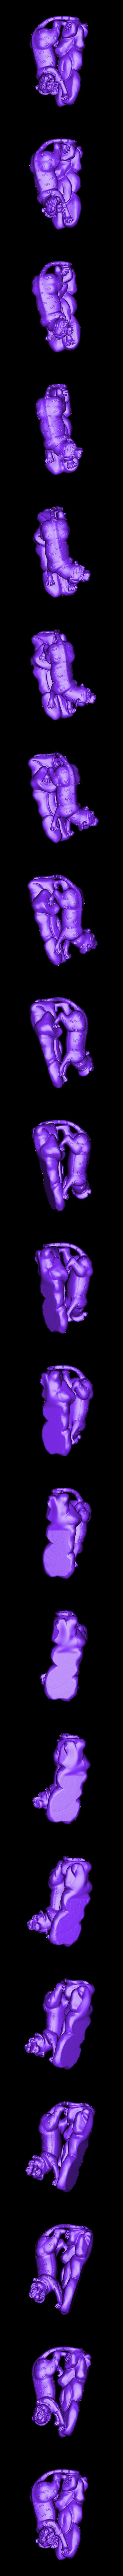 03tiger.stl Download free STL file tiger 3d model • 3D printable model, stlfilesfree